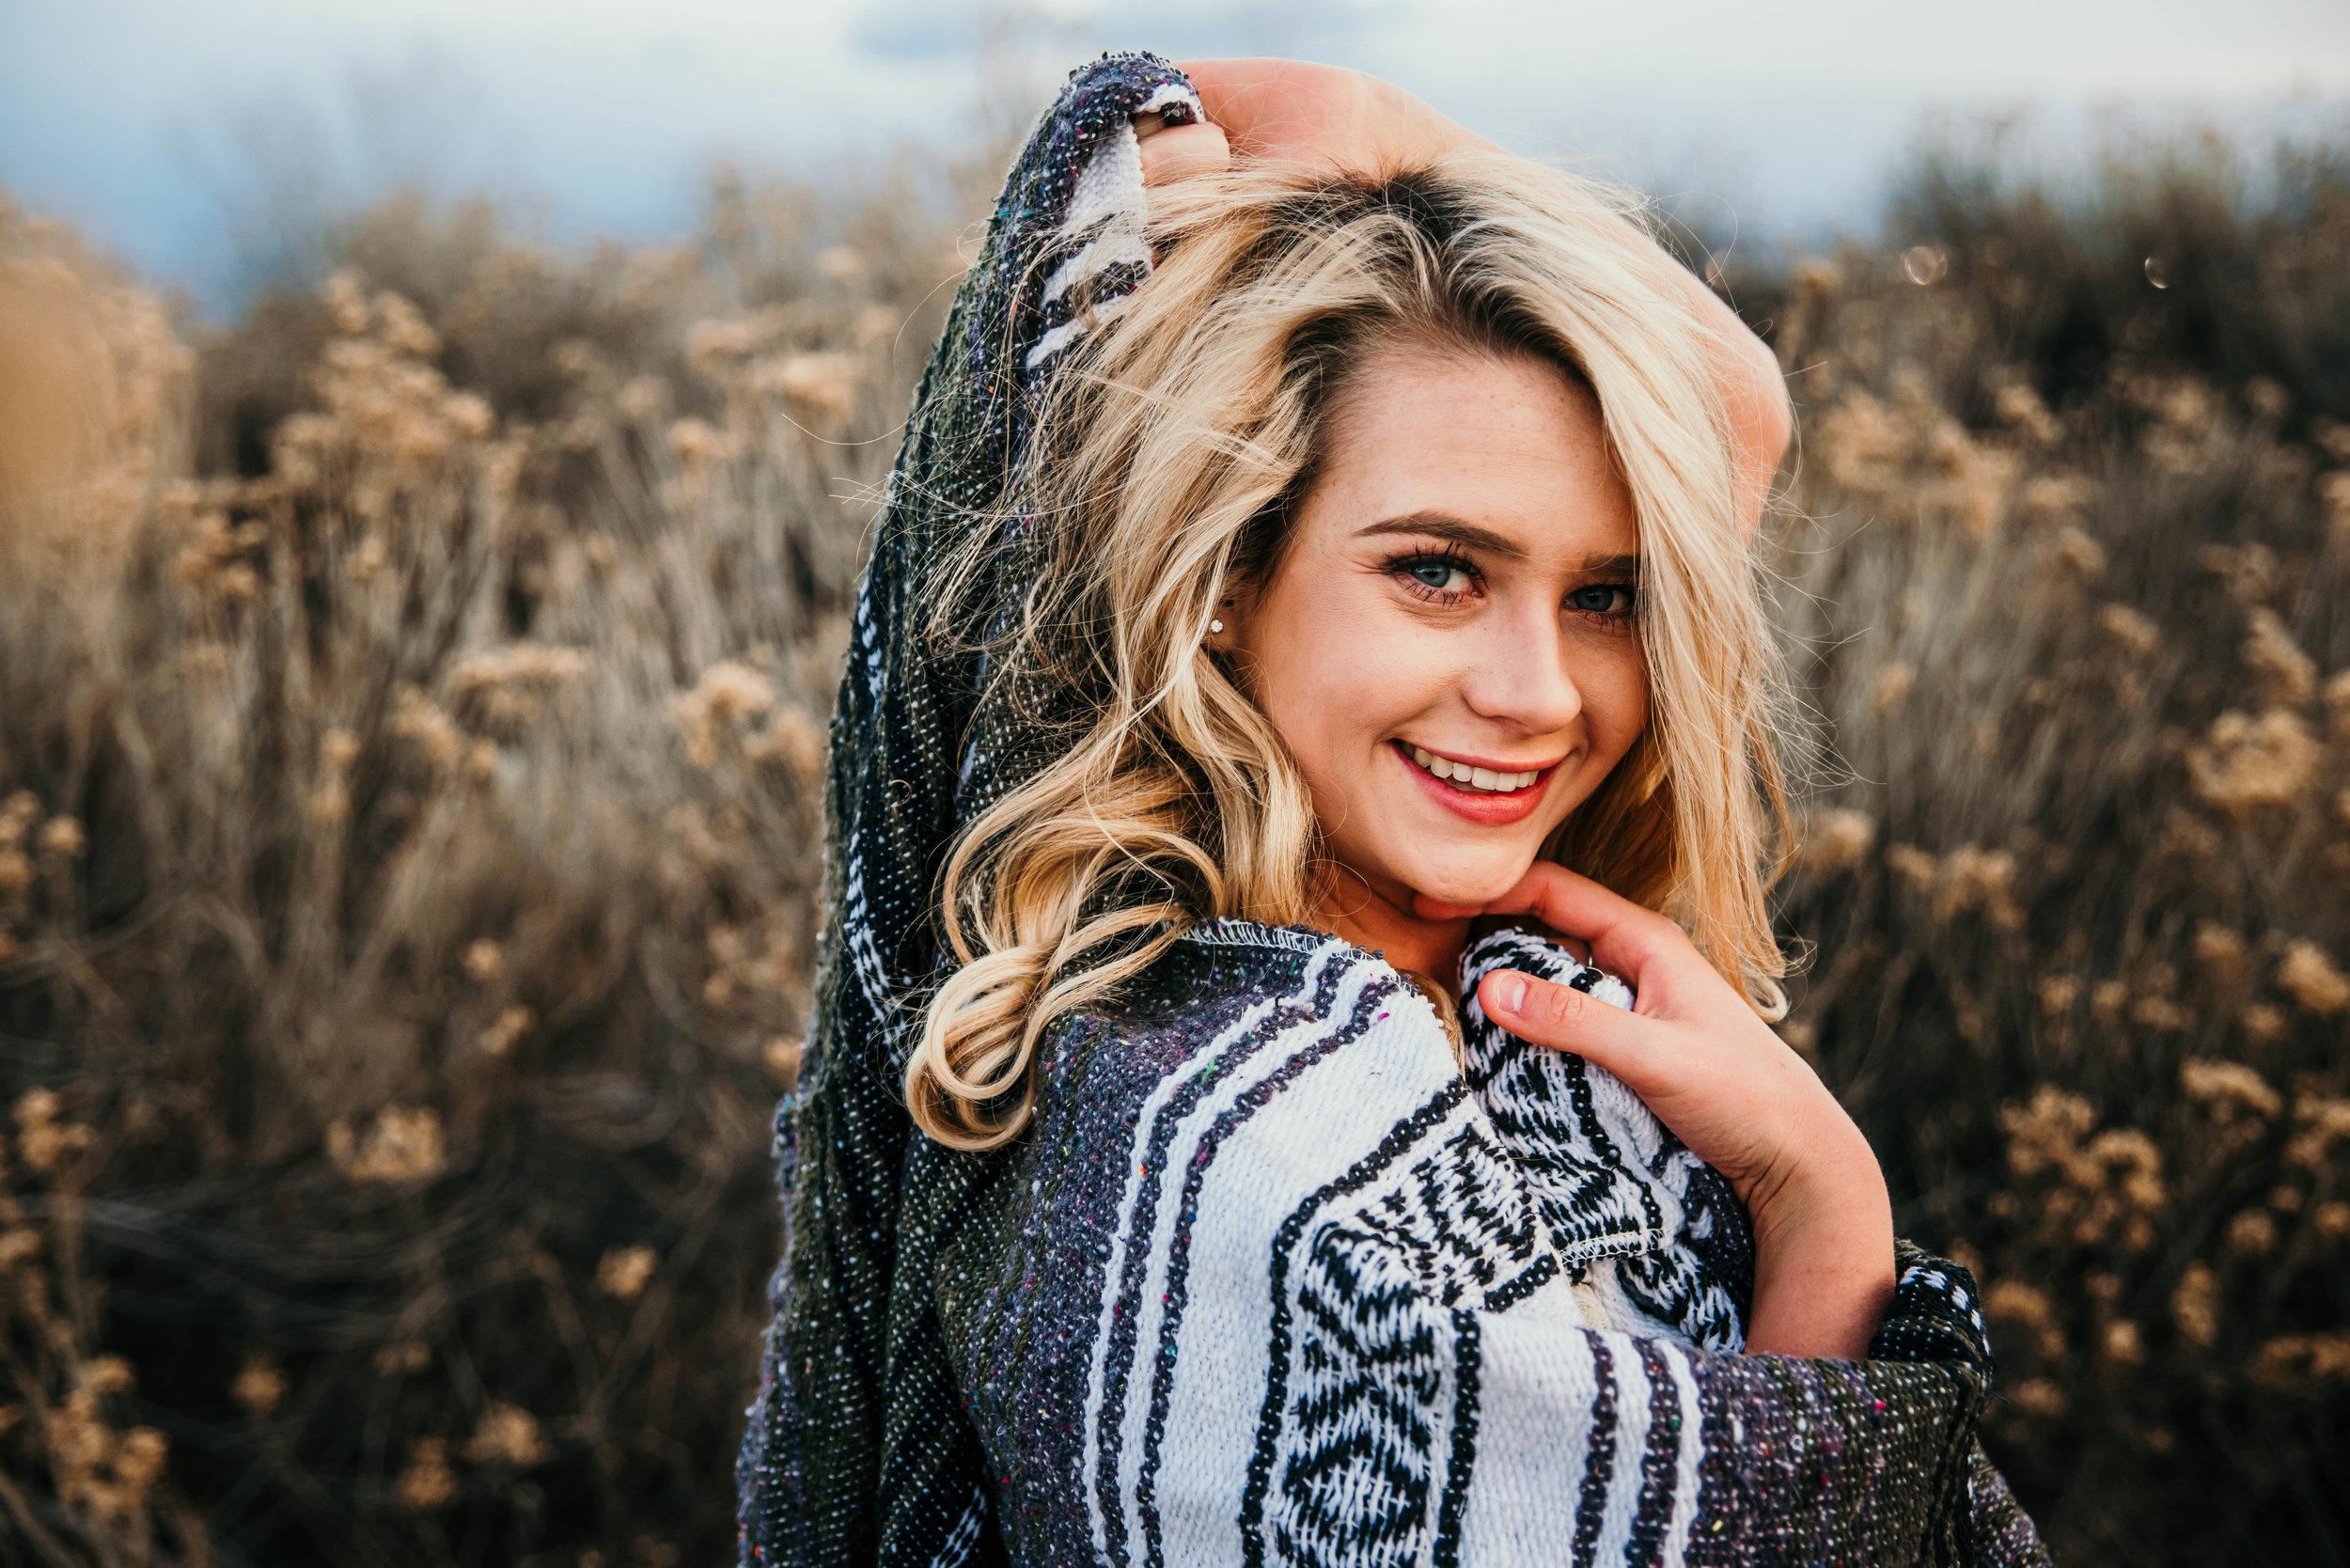 Miss. Miller's Photography | Colorado Senior Photographer | Senior Photo ideas | senior photos | senior photos for girls | girls senior photos | blankets in photos | lifestyle photos girls